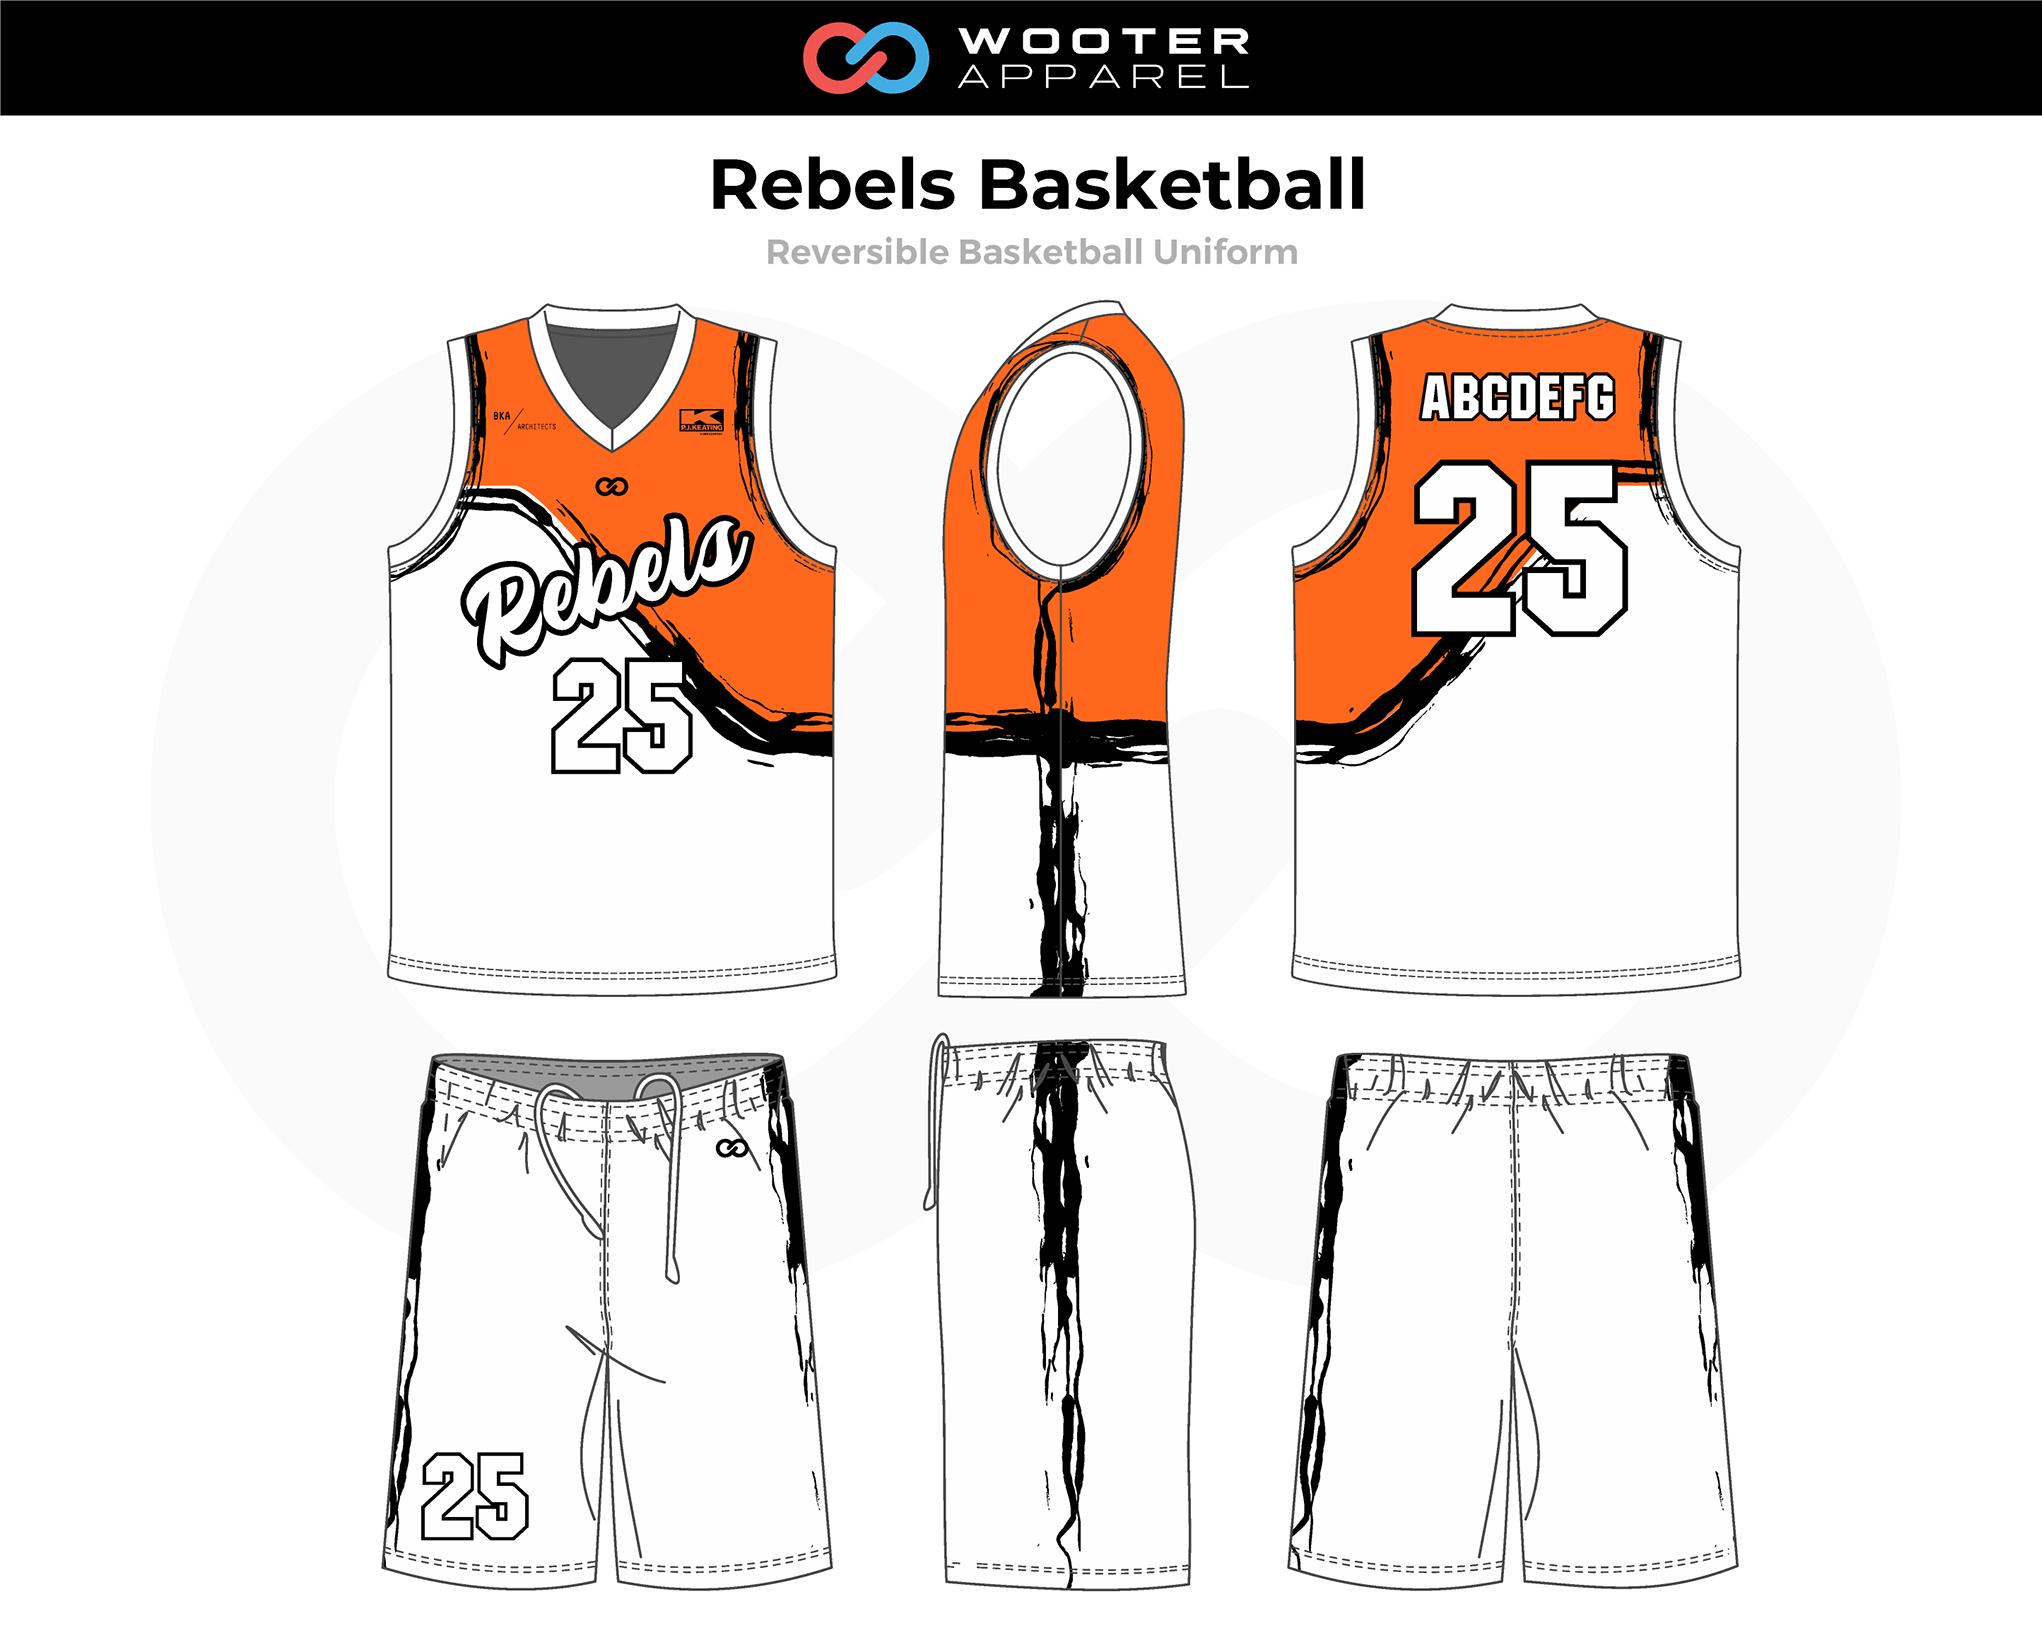 2019-02-26 Rebels Basketball Reversible Uniform (Side A).png